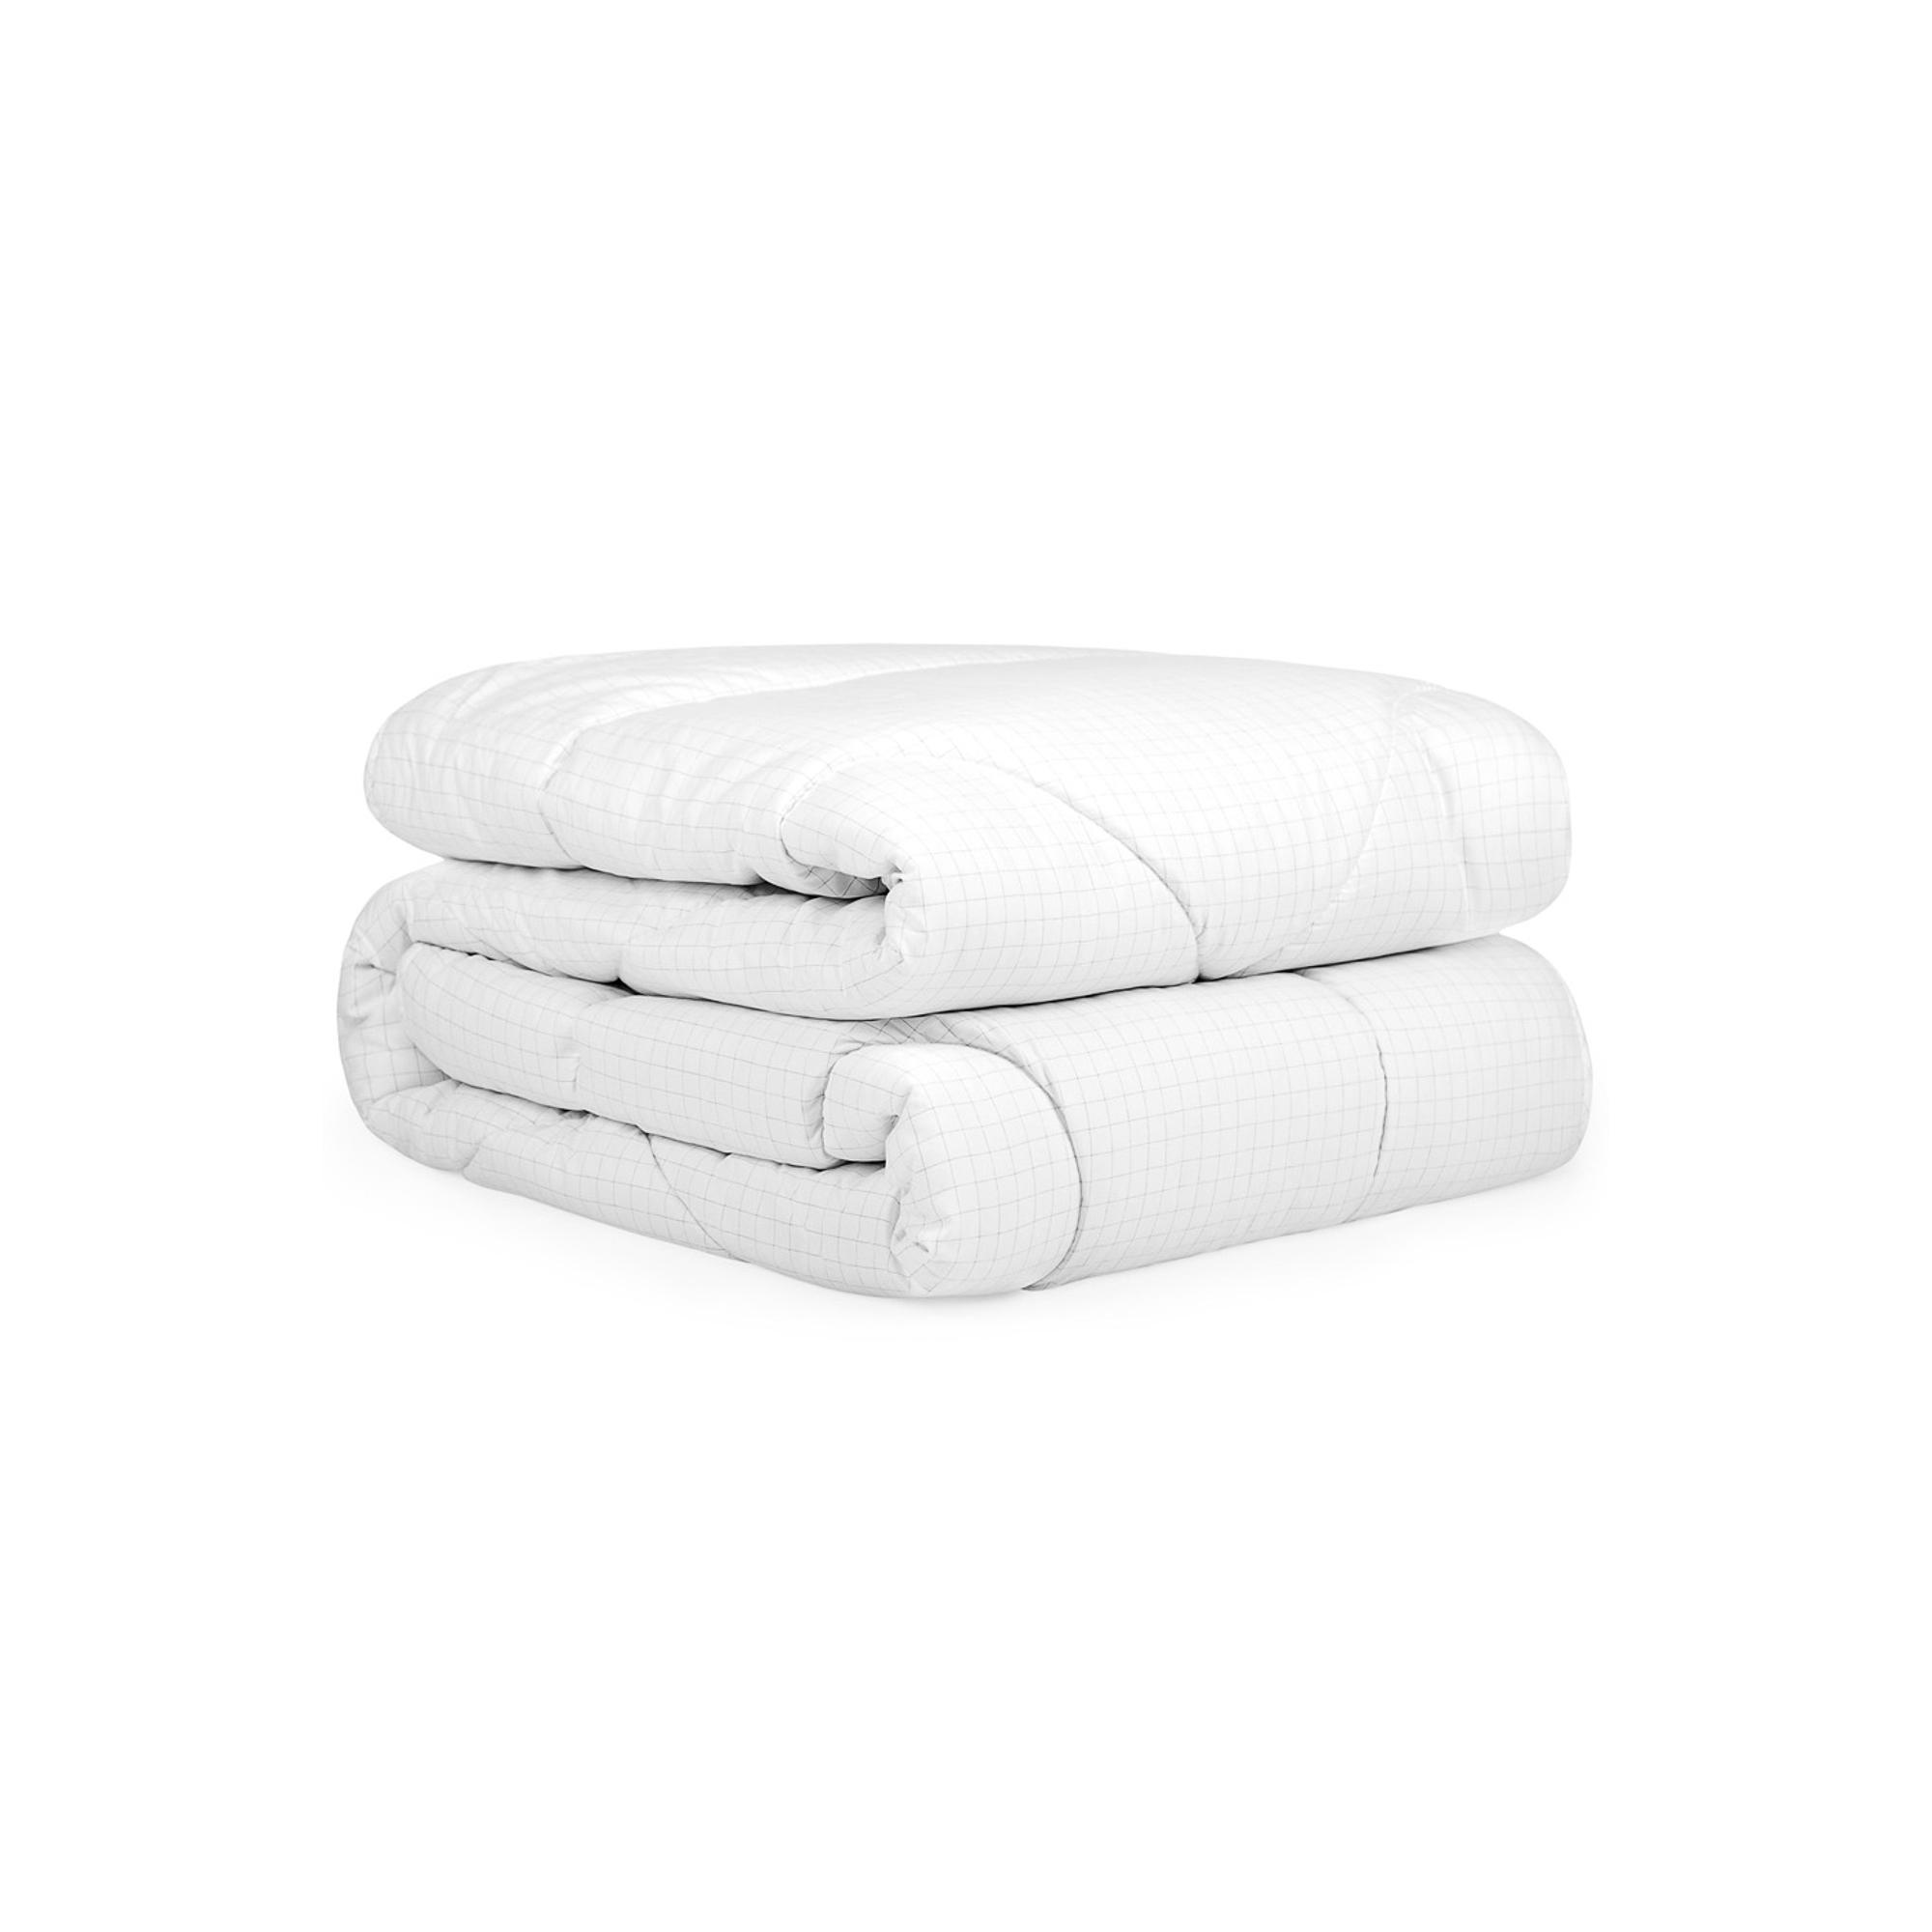 Купить со скидкой Одеяло Classic by T Relax 175х205 см